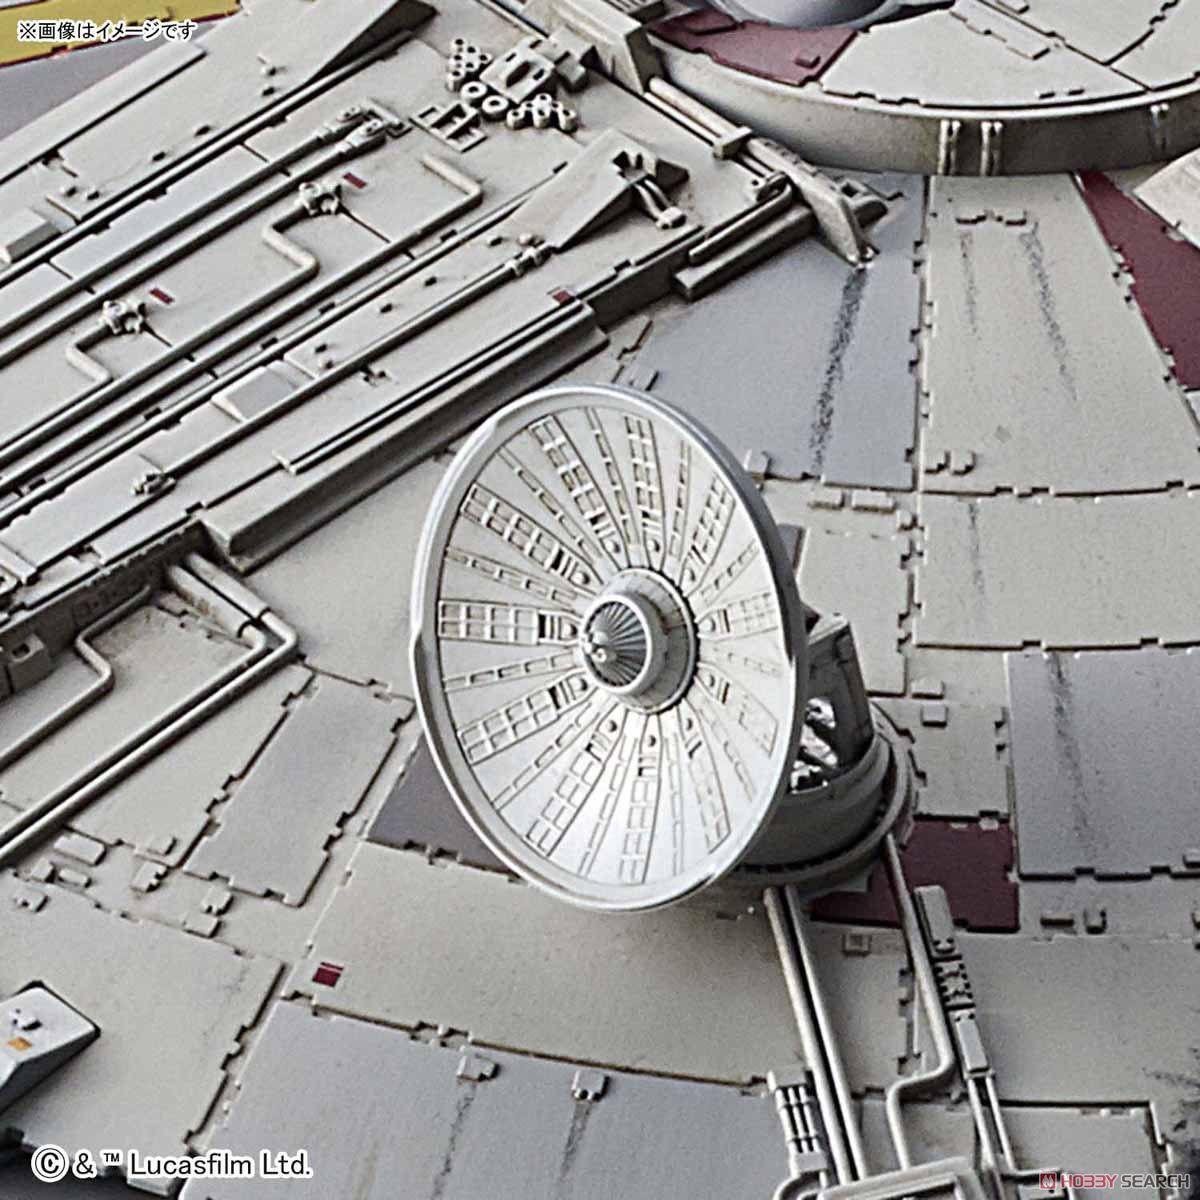 Bandai 5058195 Millennium Falcon (The Rise of Skywalker)